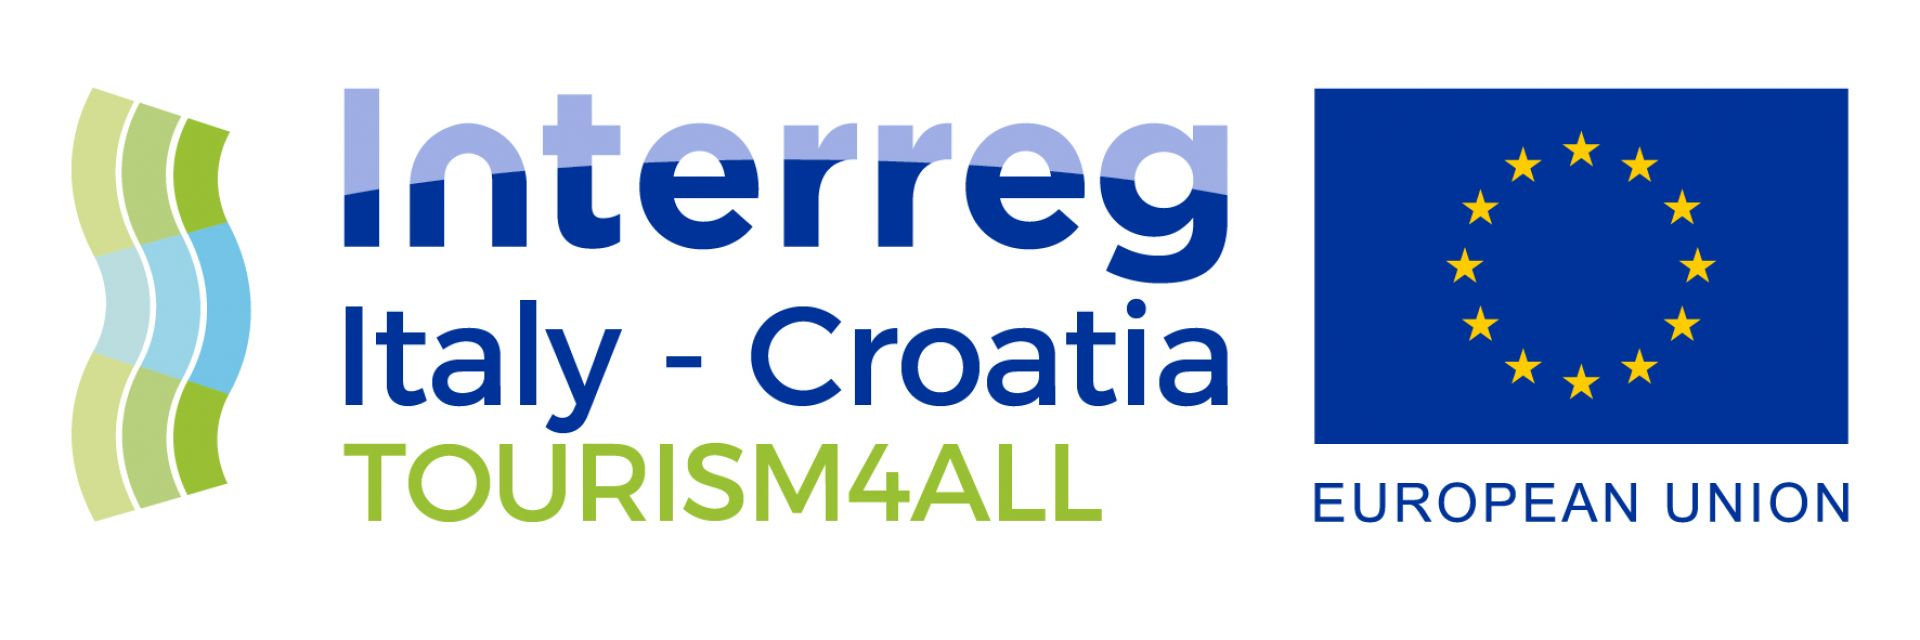 tourism4all logotip